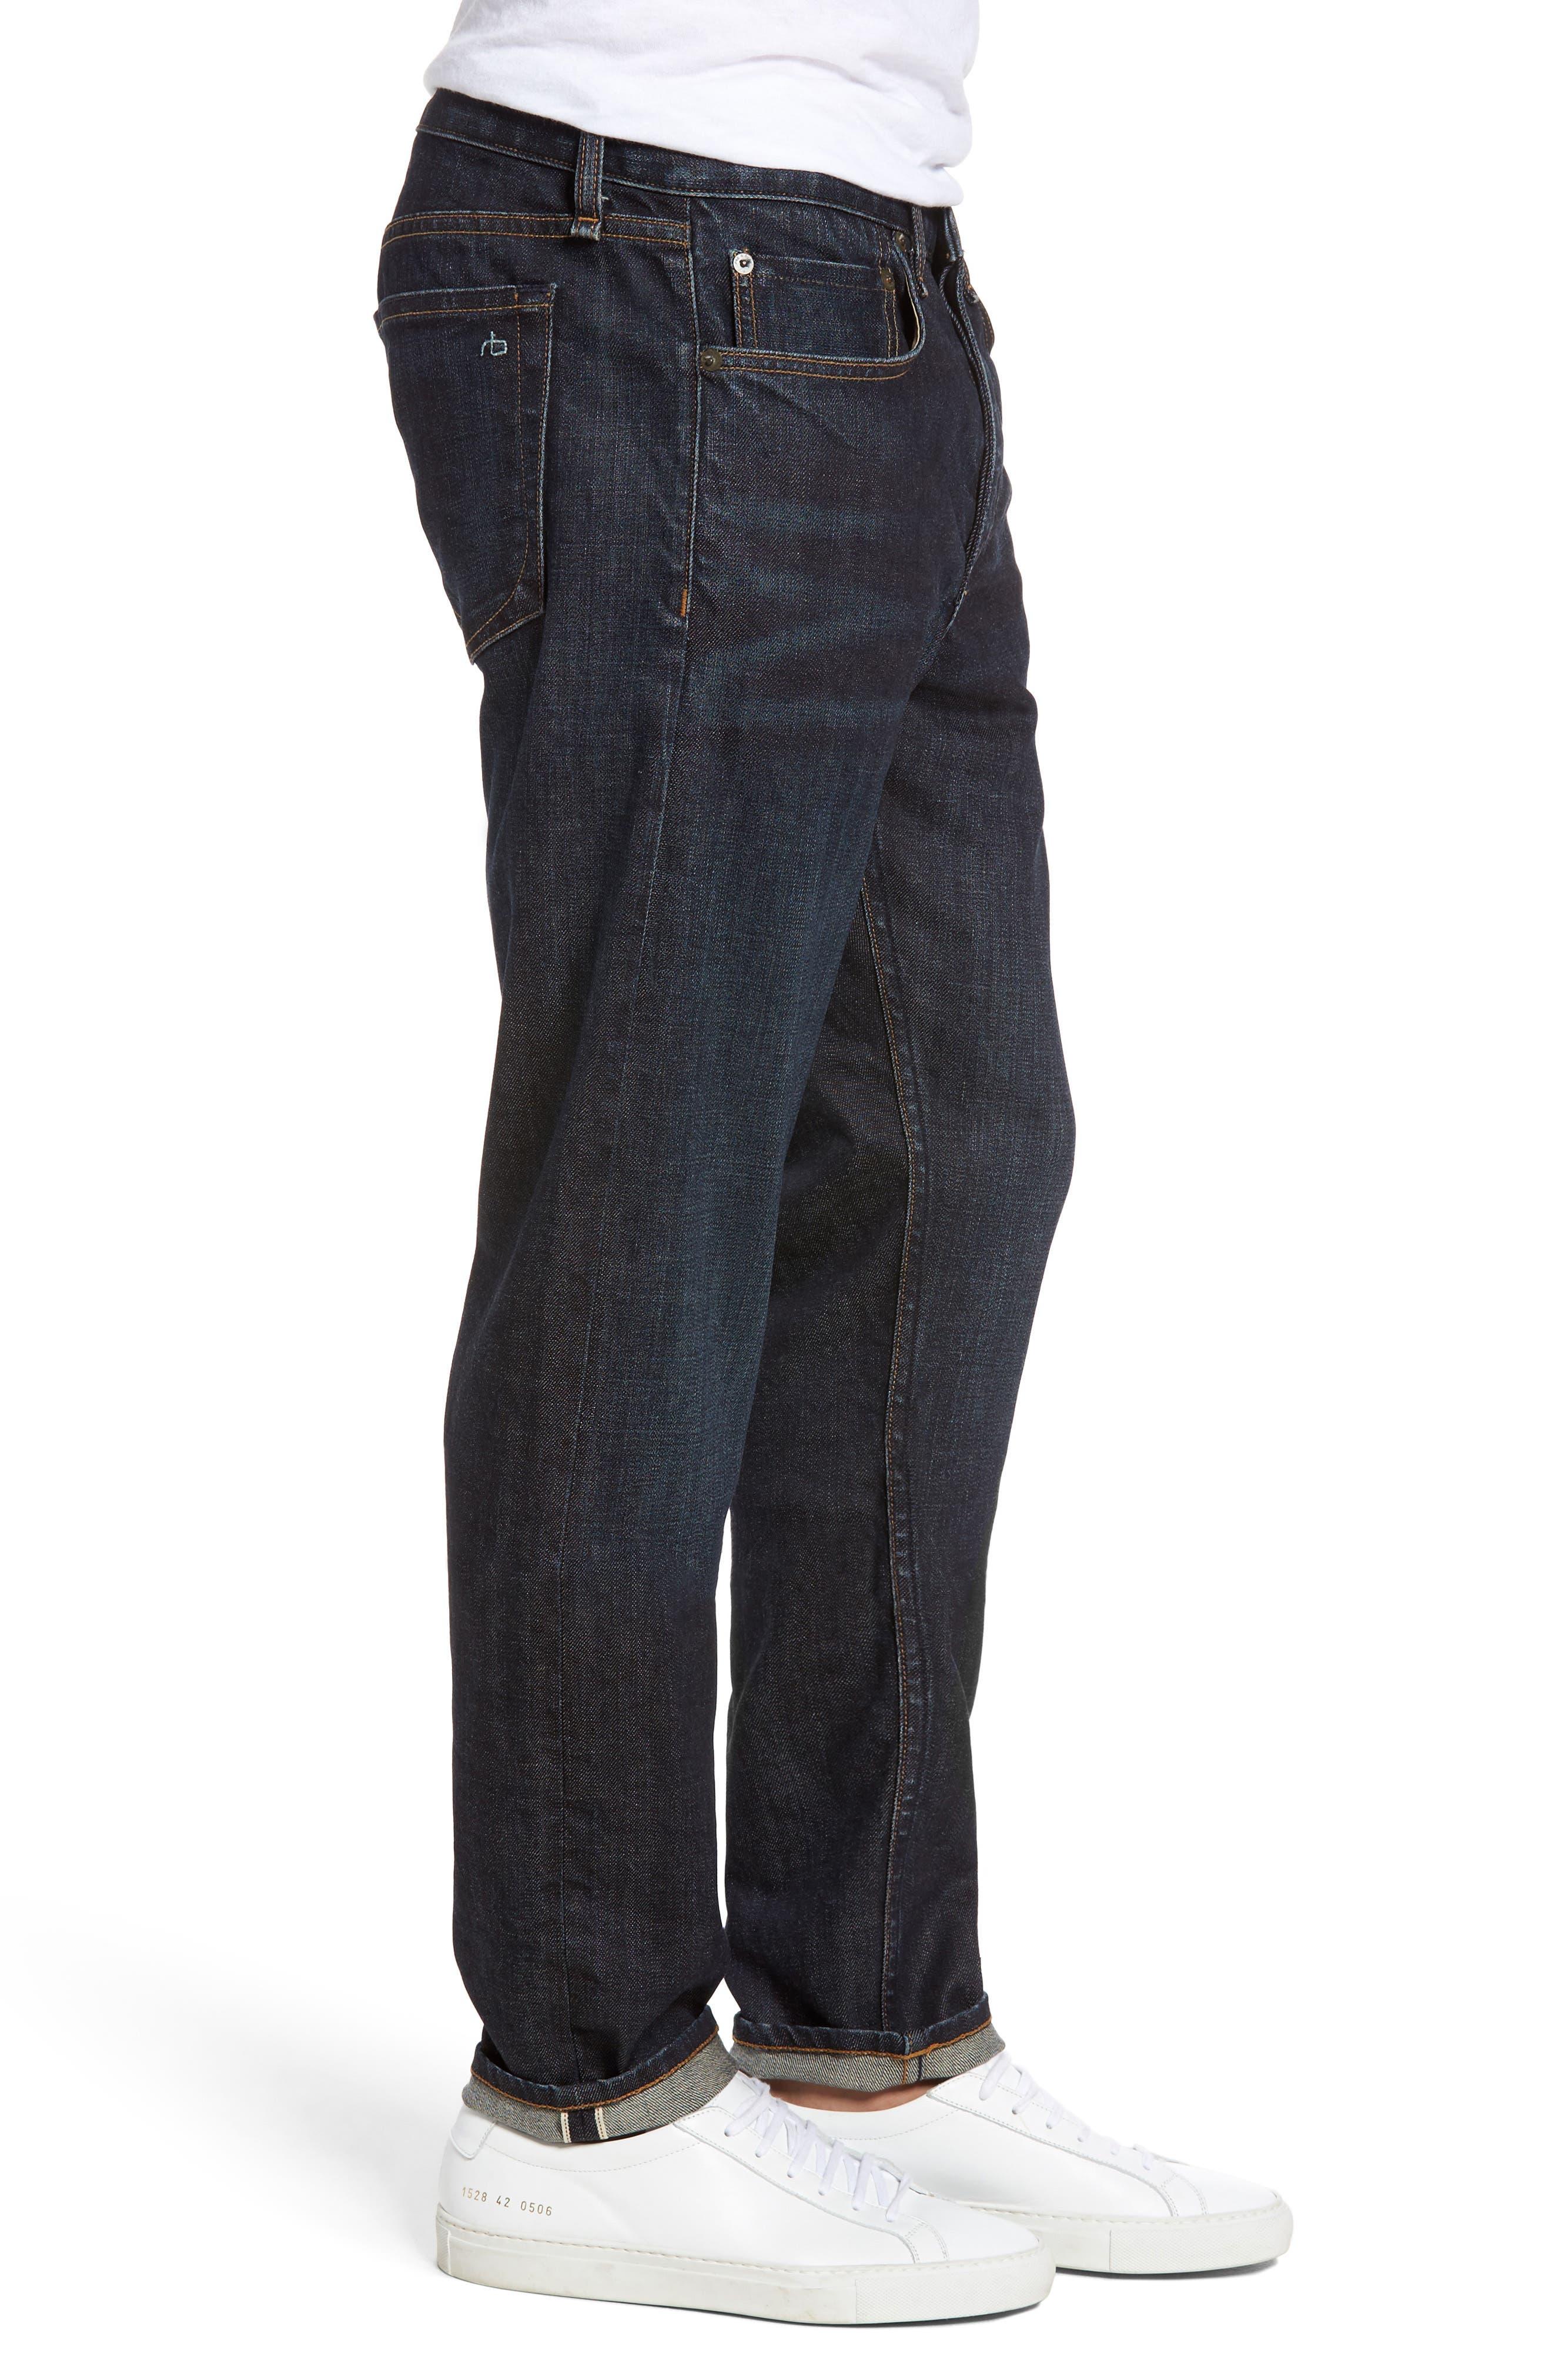 Alternate Image 3  - rag & bone Fit 2 Slim Fit Selvedge Jeans (Tempest)